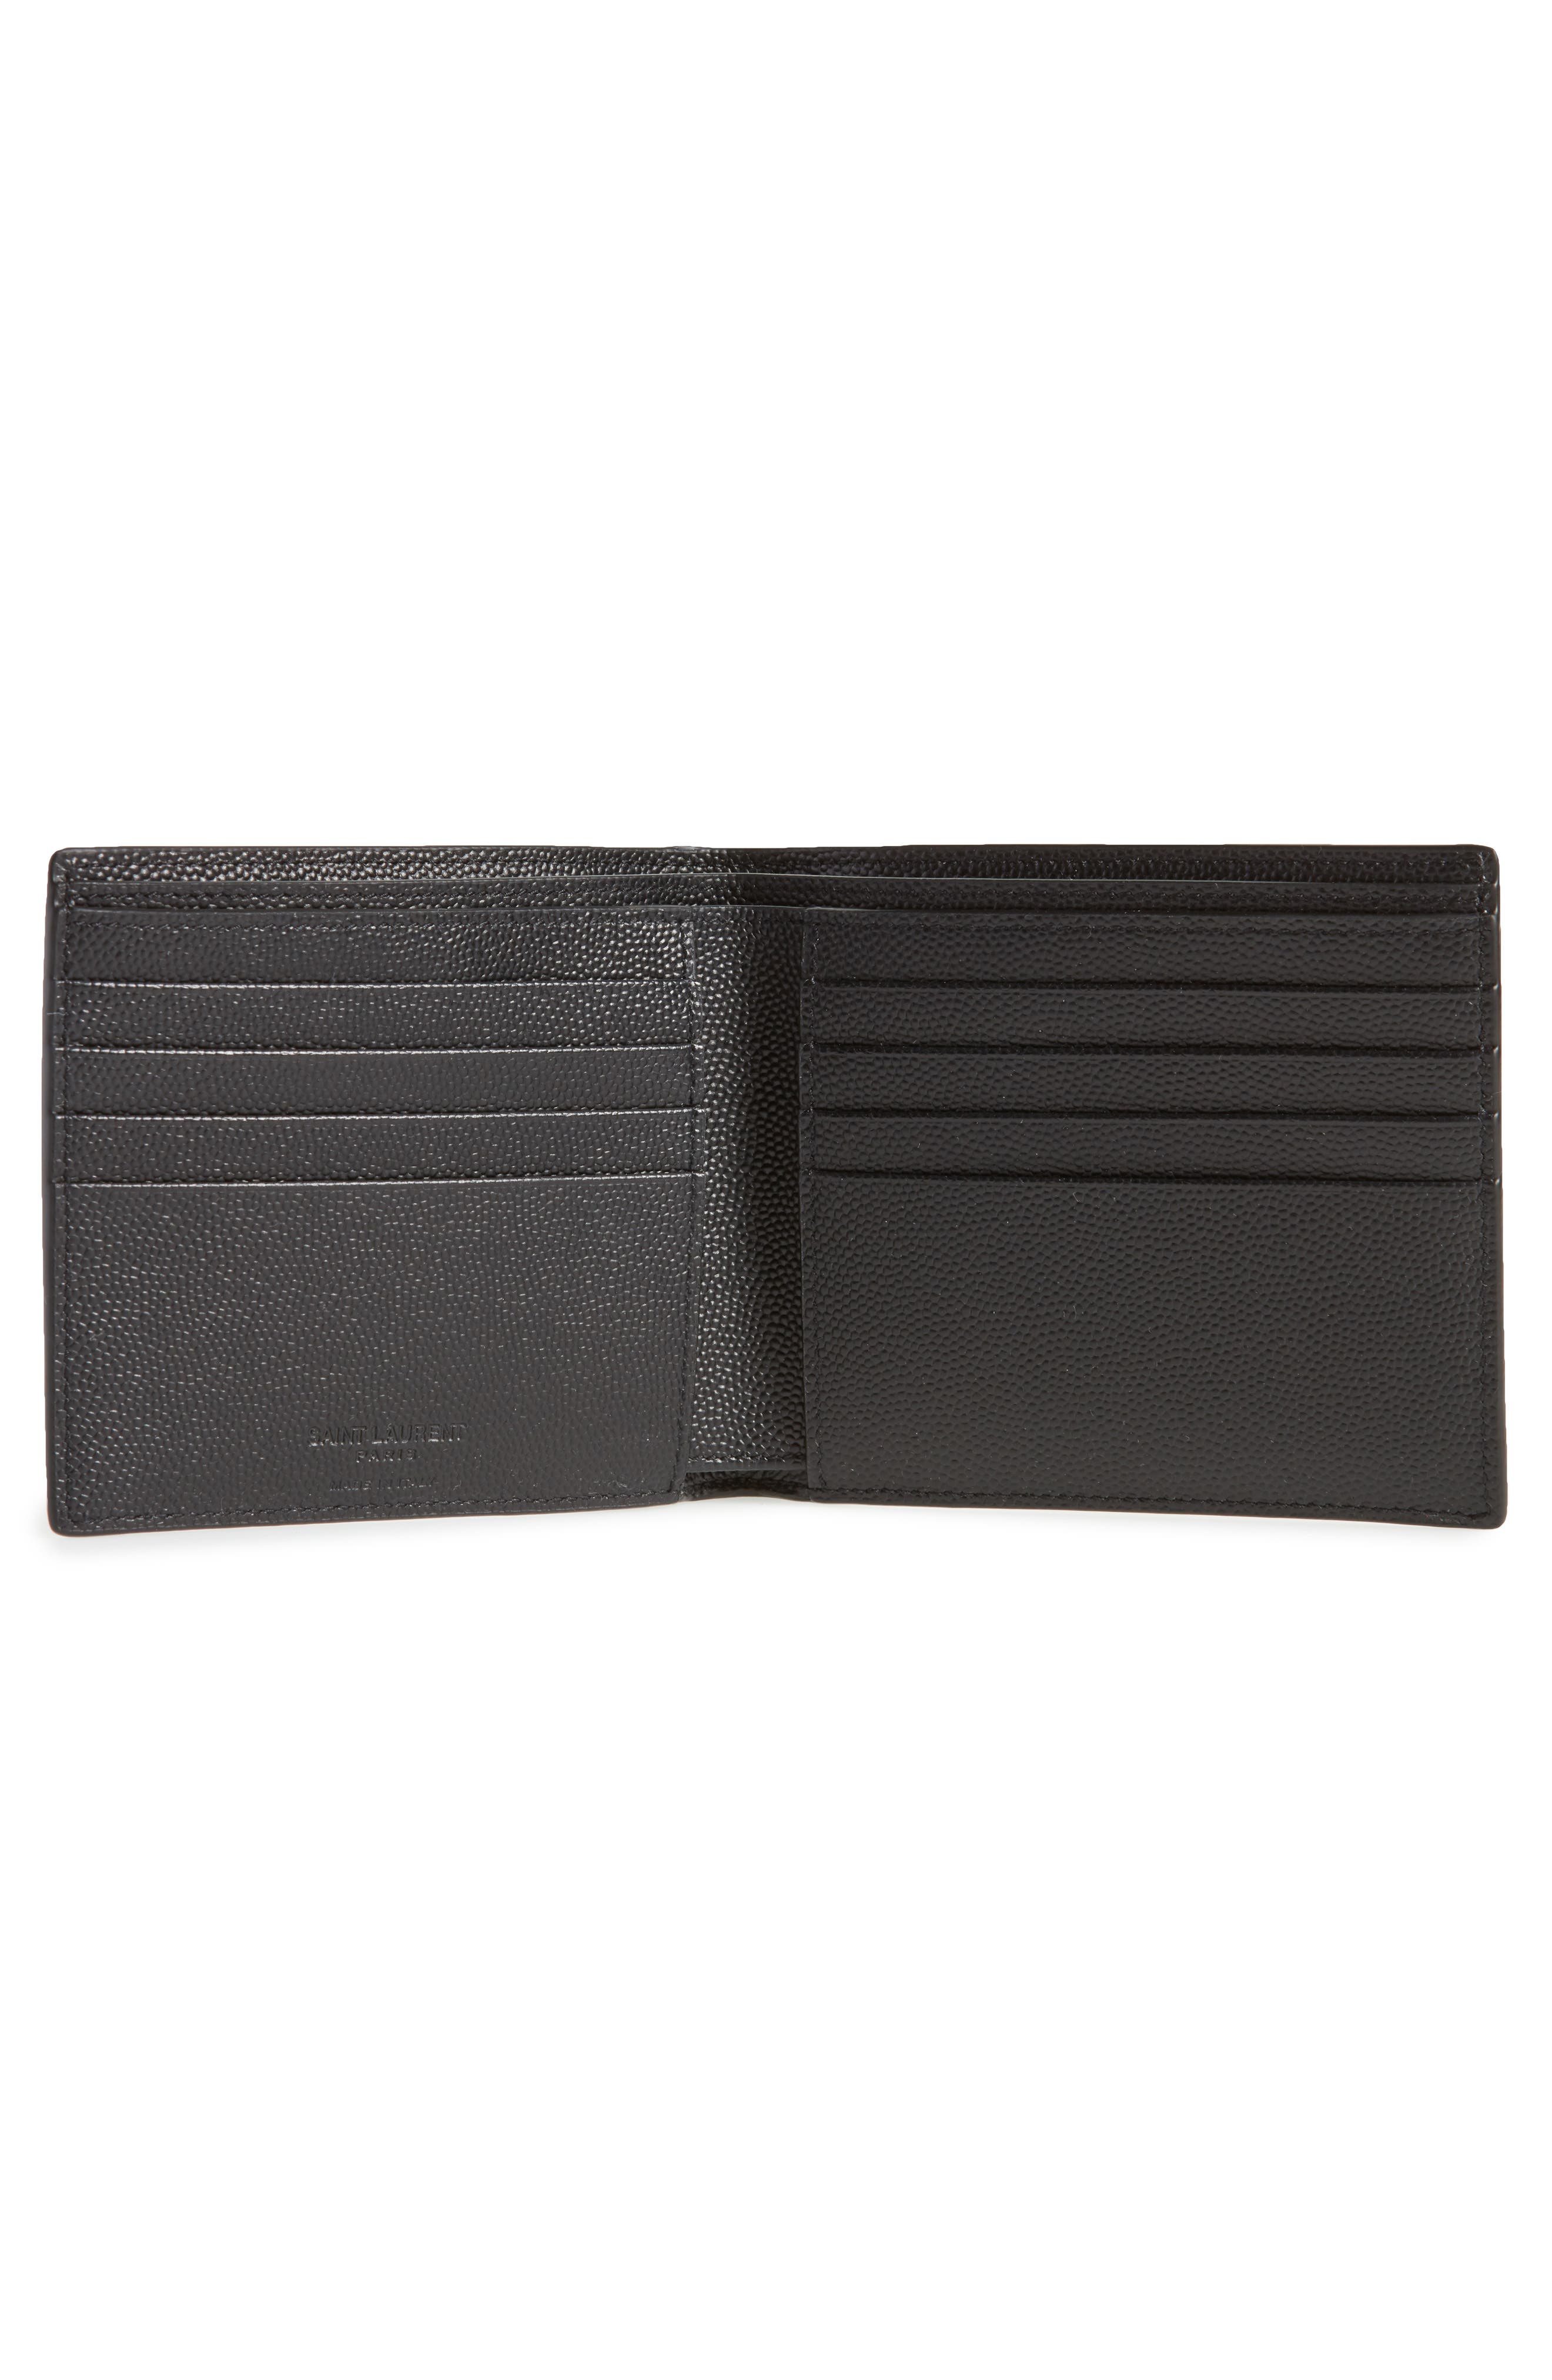 Pebble Grain Leather Wallet,                             Alternate thumbnail 2, color,                             001